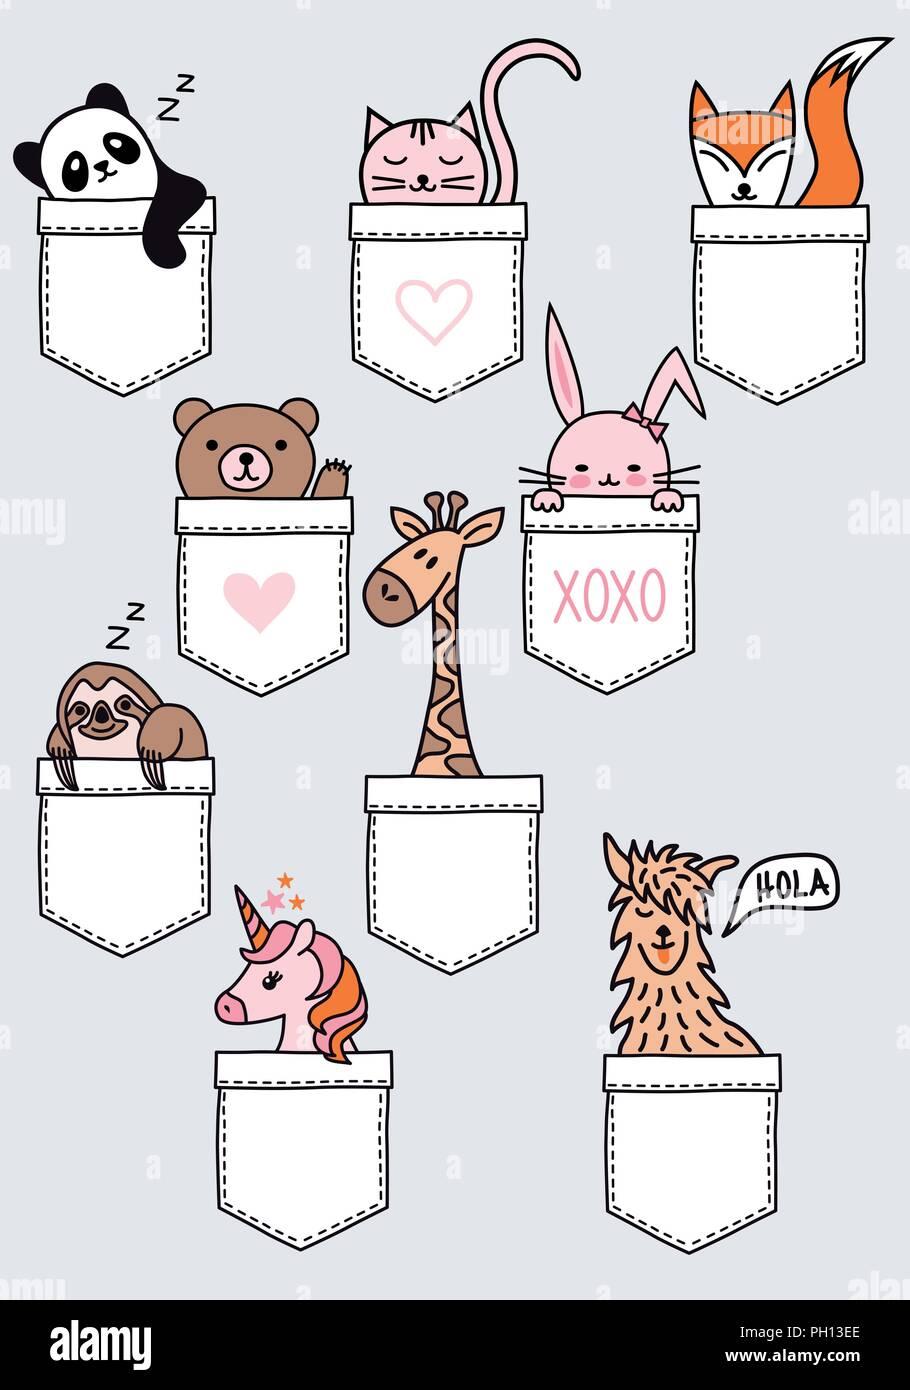 Cute baby animals sitting in a pocket, panda, bear, cat, fox, bunny, sloth, giraffe, unicorn, lama, set of vector design elements Stock Vector